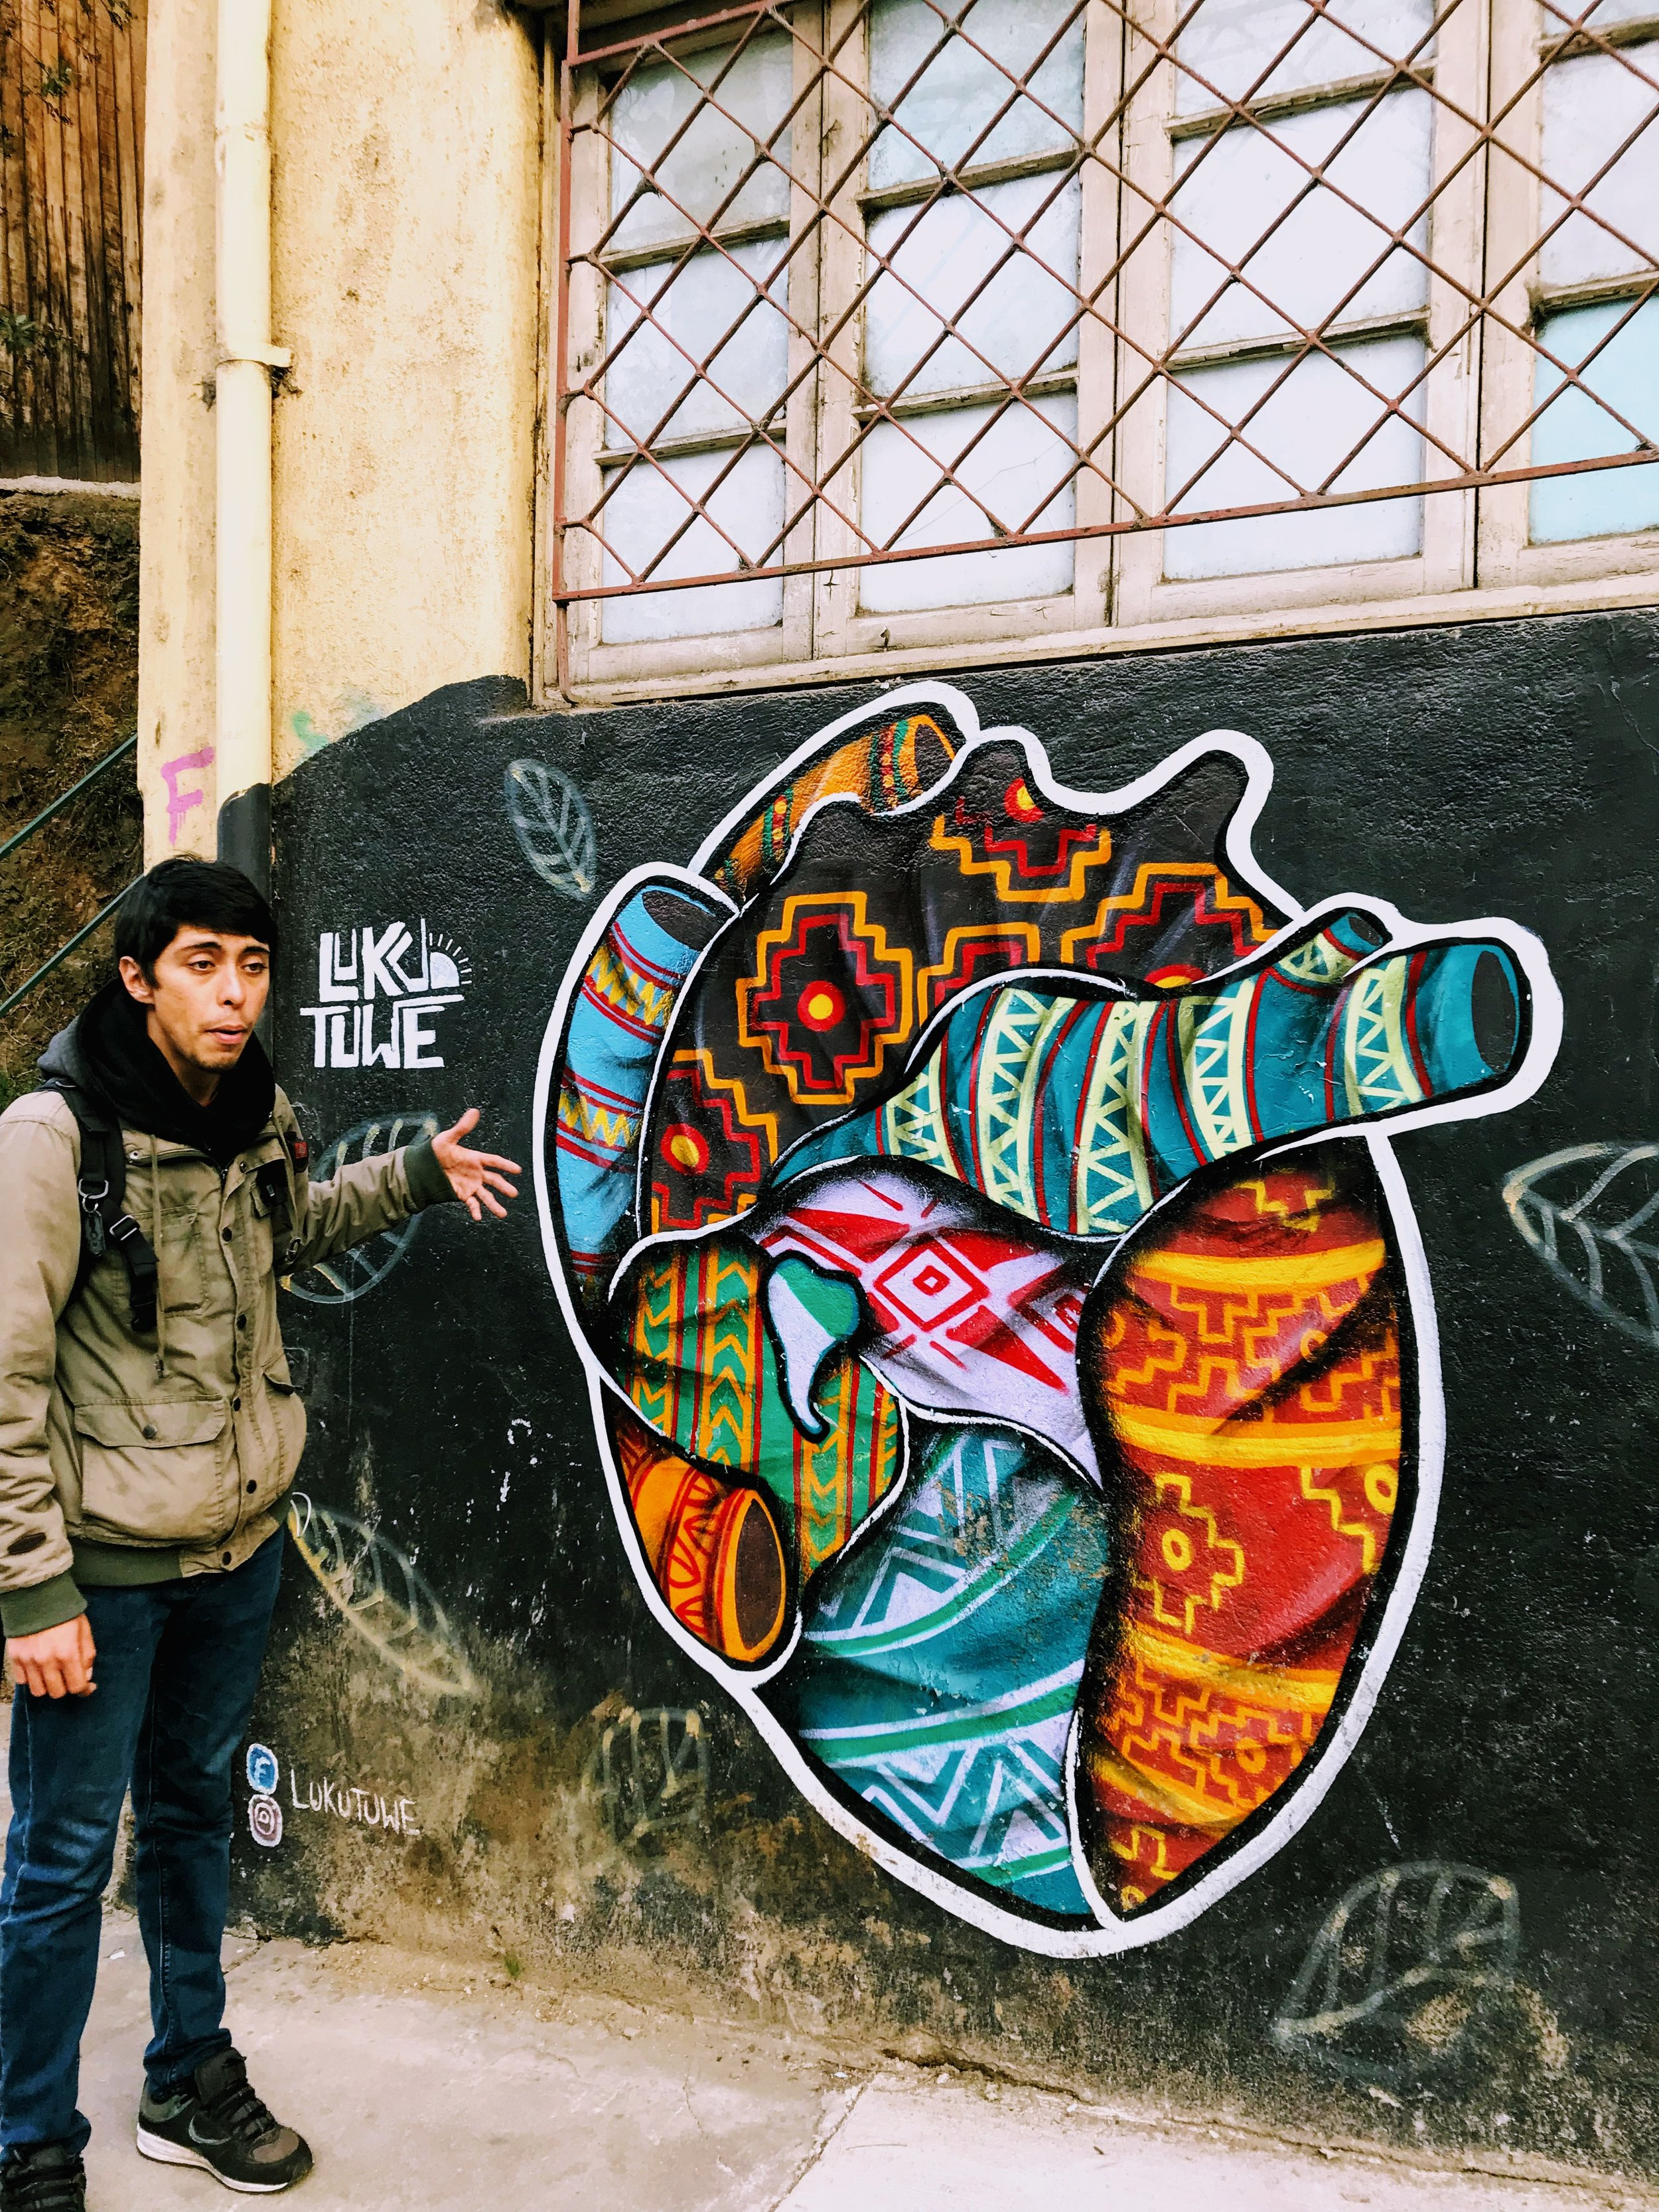 Eddie teaching me about the badass world of graffiti and street art